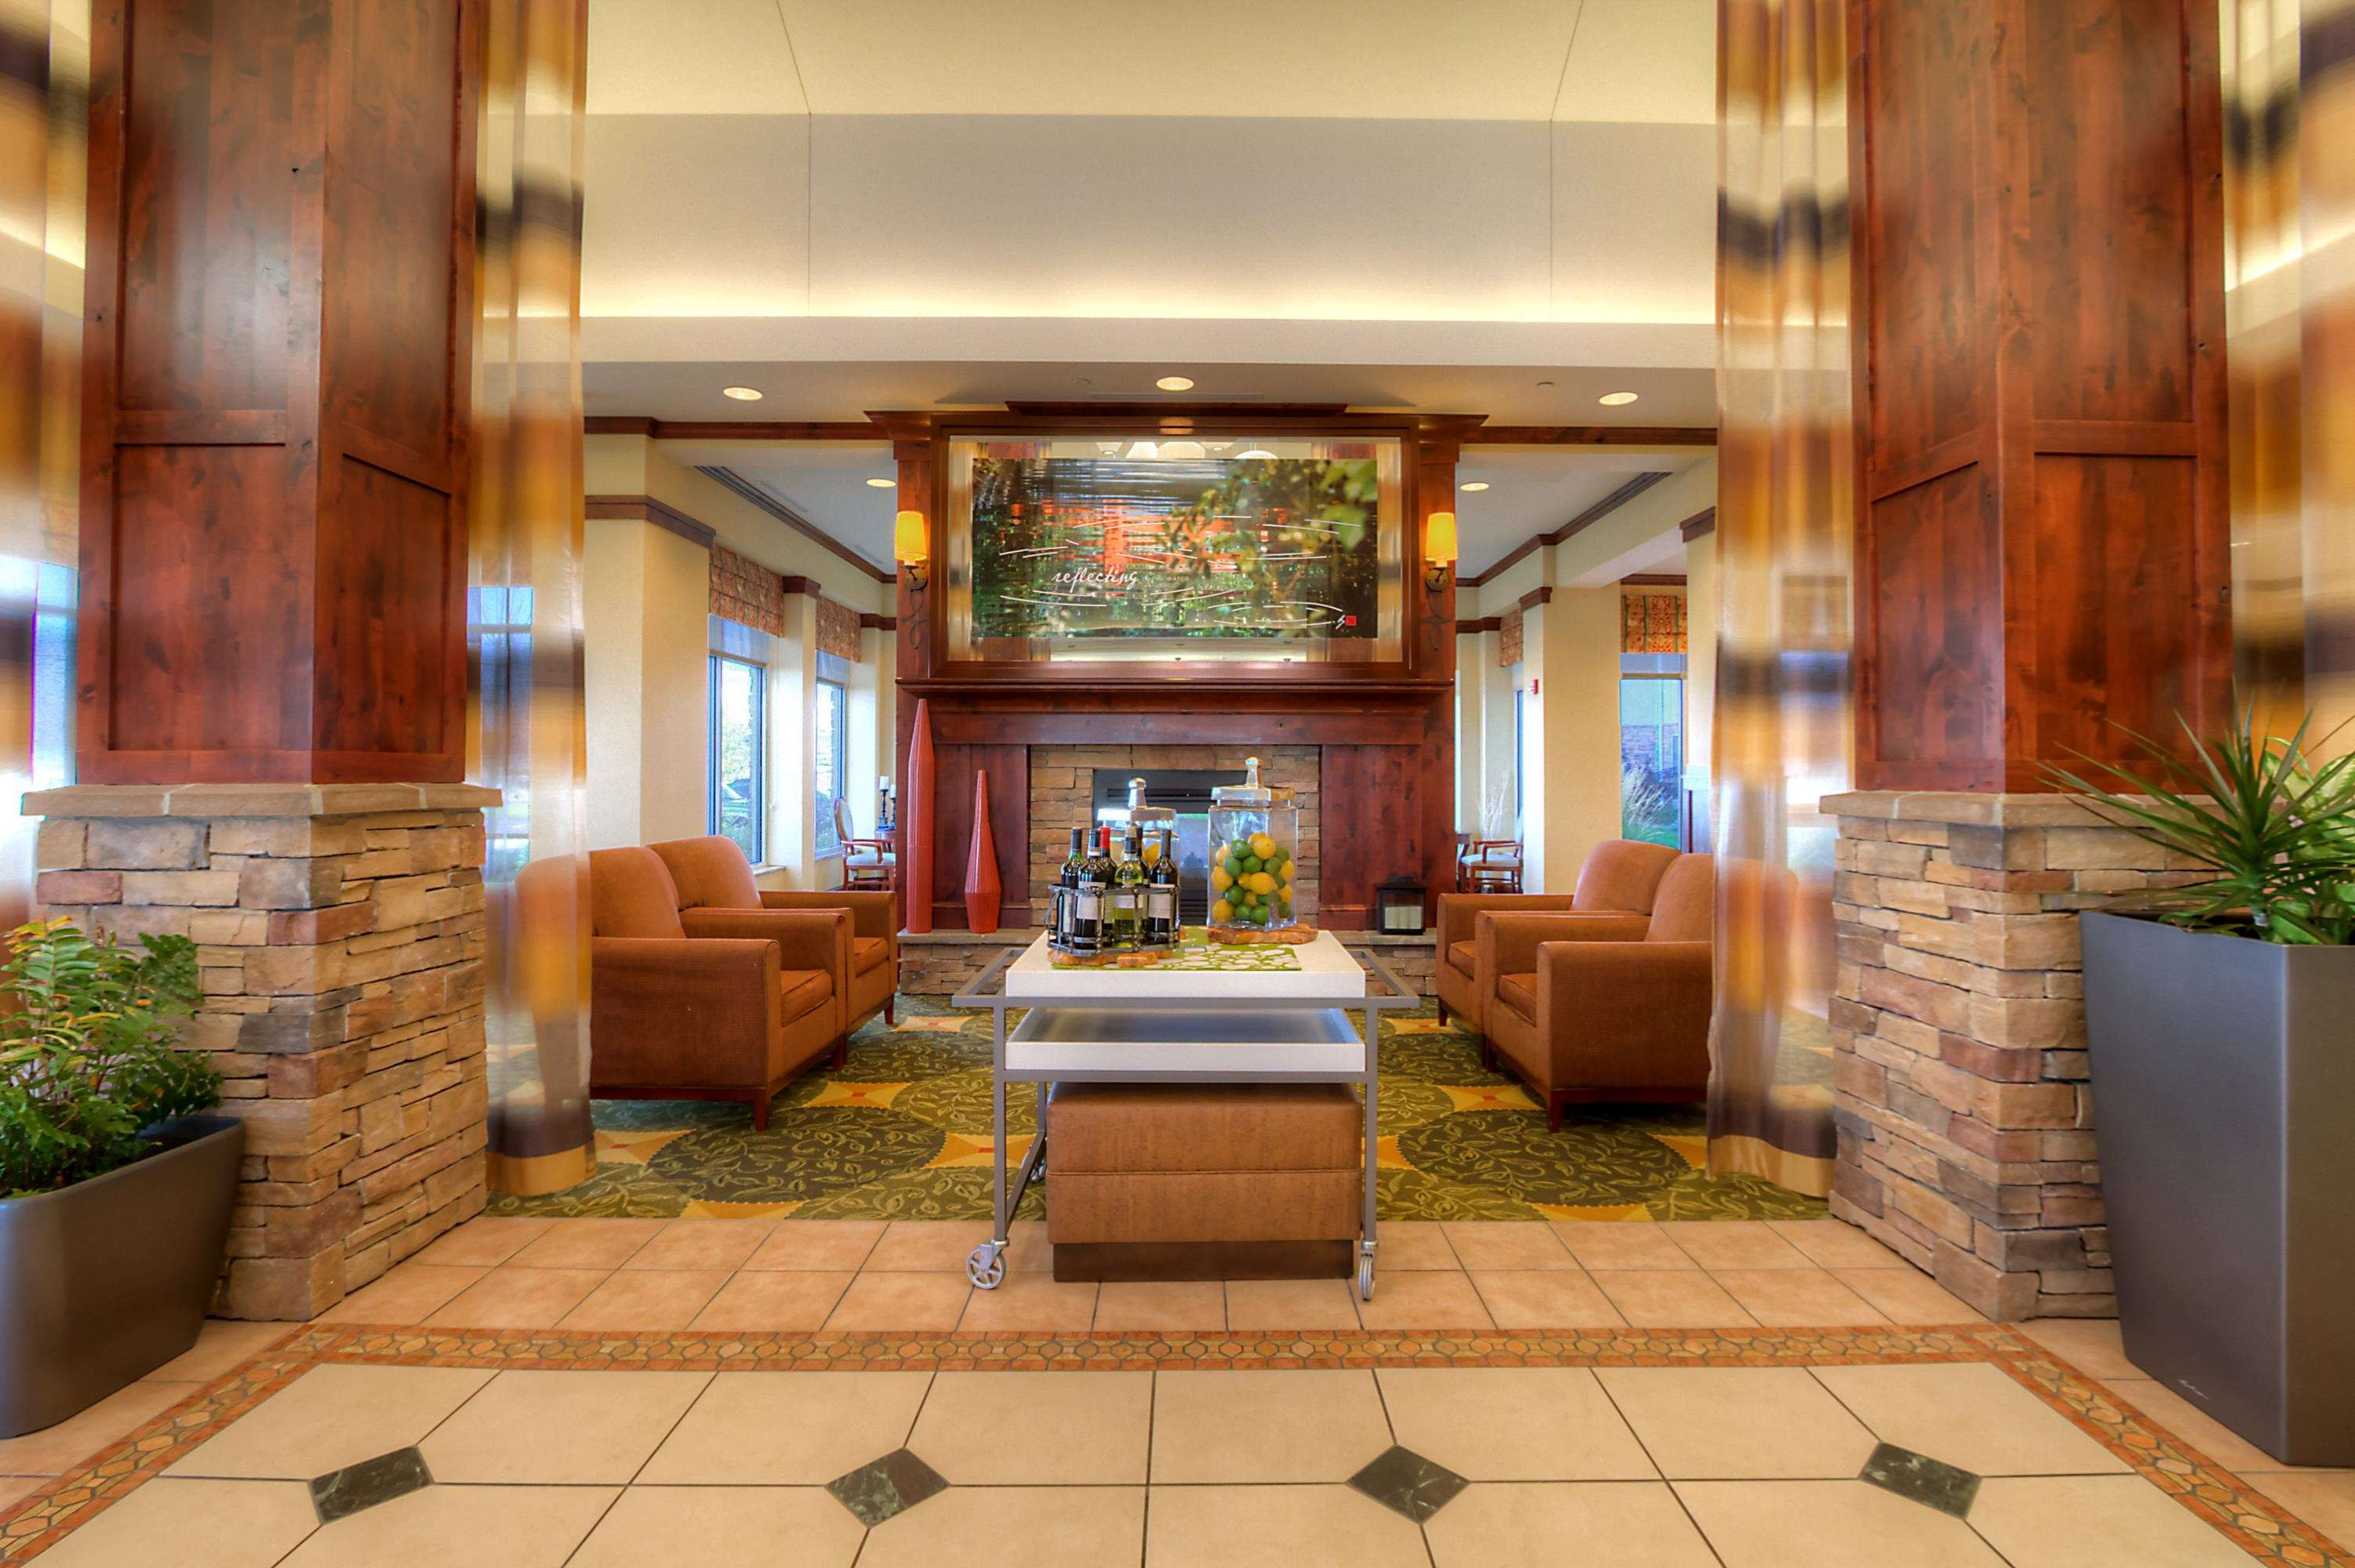 Hilton Garden Inn Great Falls image 3